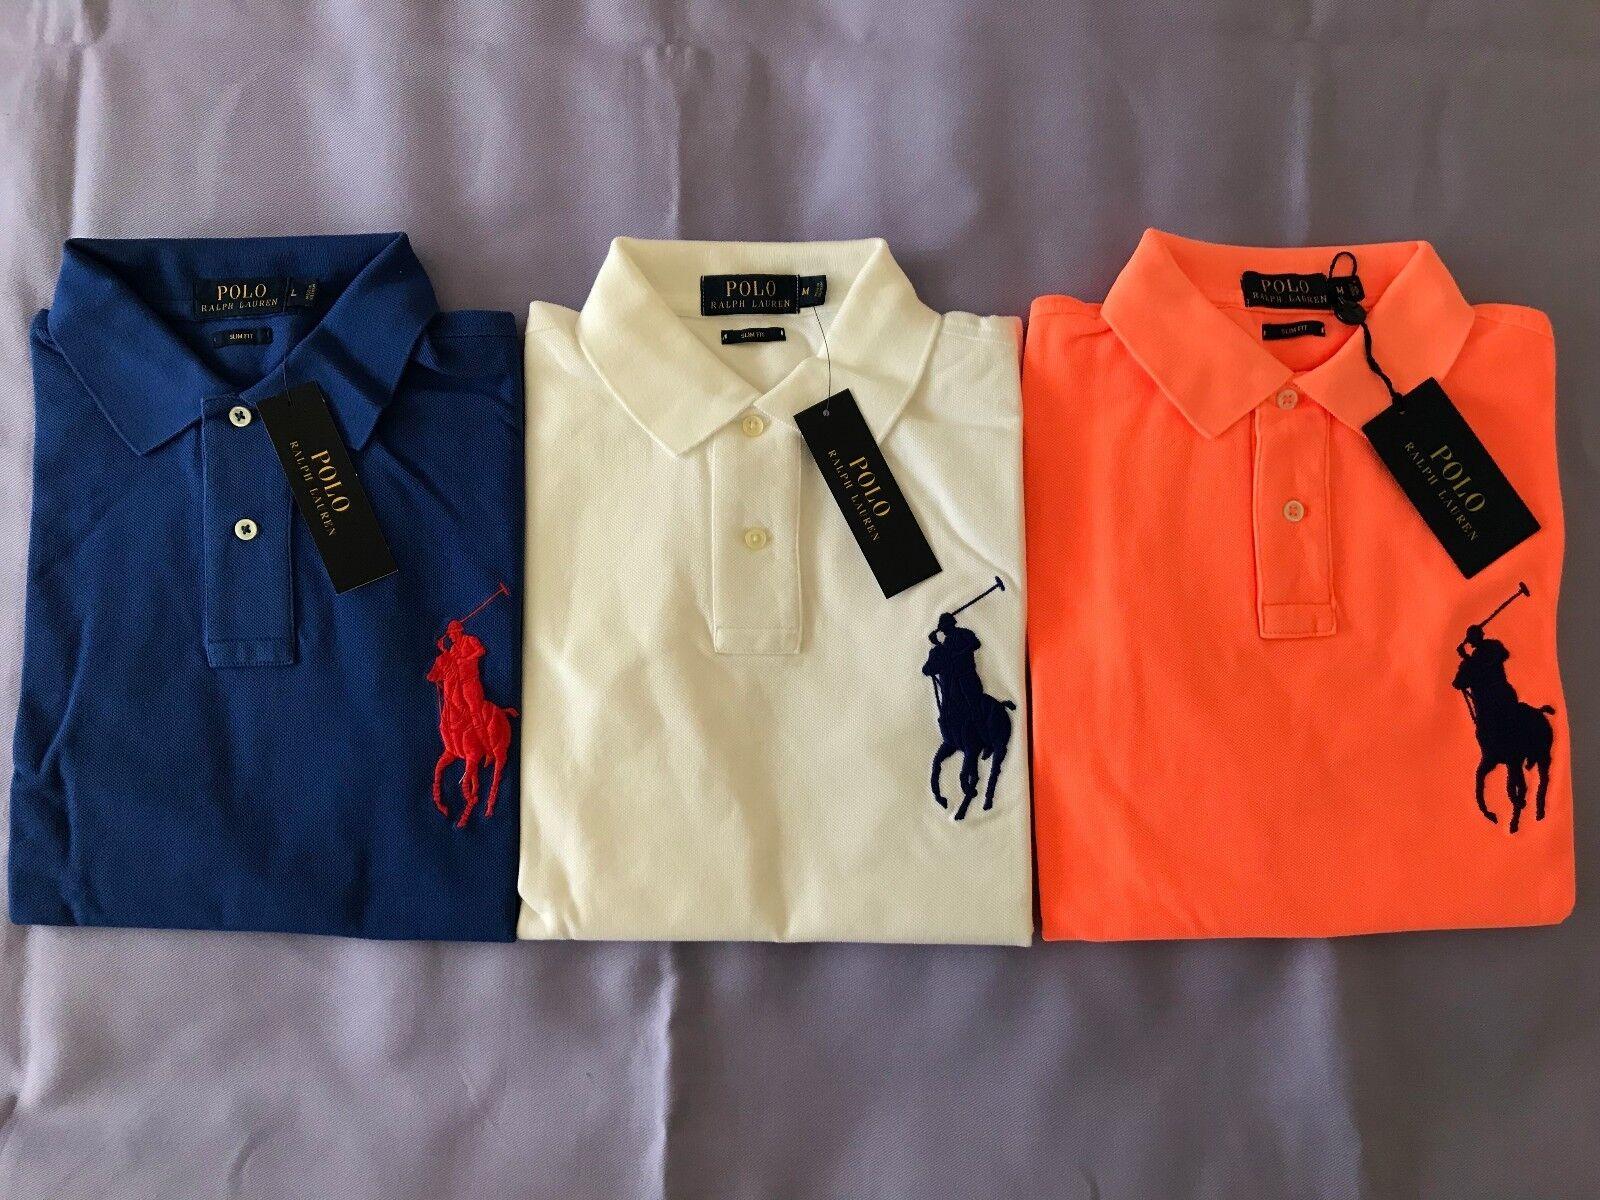 NWT RALPH LAUREN Slim Fit 100% Cotton Polo Shirt S/S  Herren Größes Medium, Large